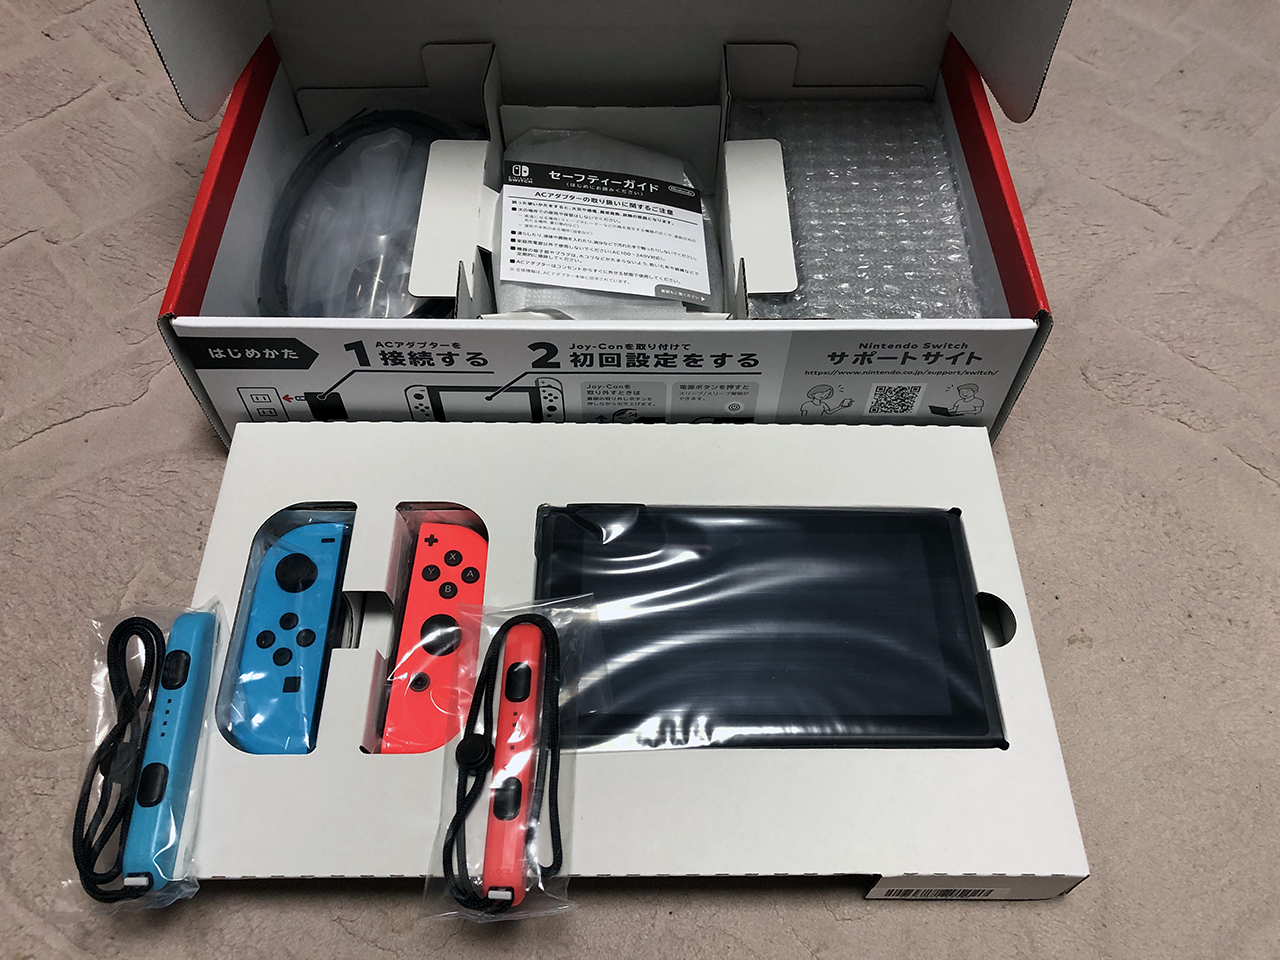 Nintendo公式で購入したからこそのカラーストラップ